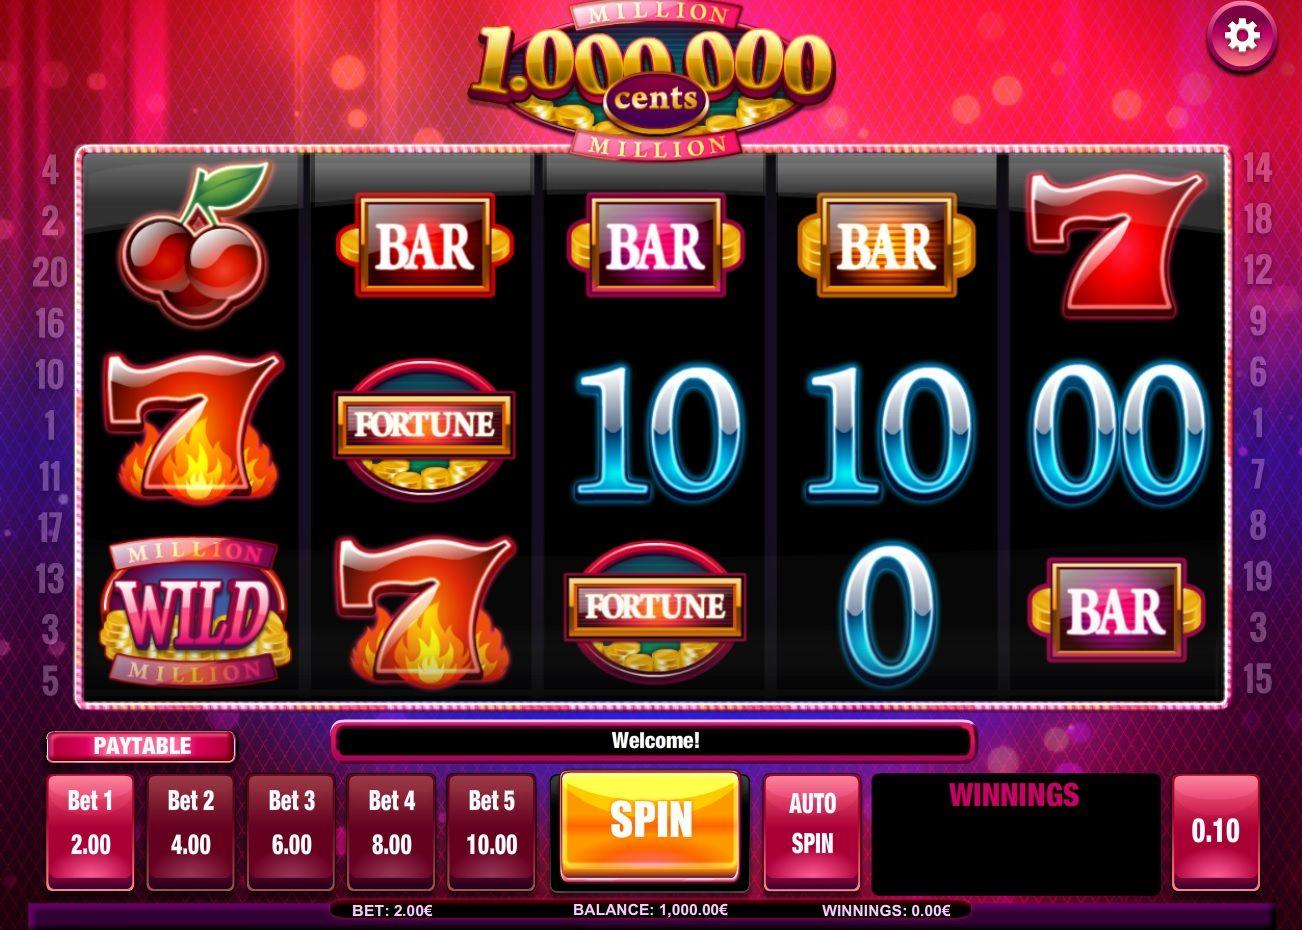 Million Cents Free Slot Machine Game